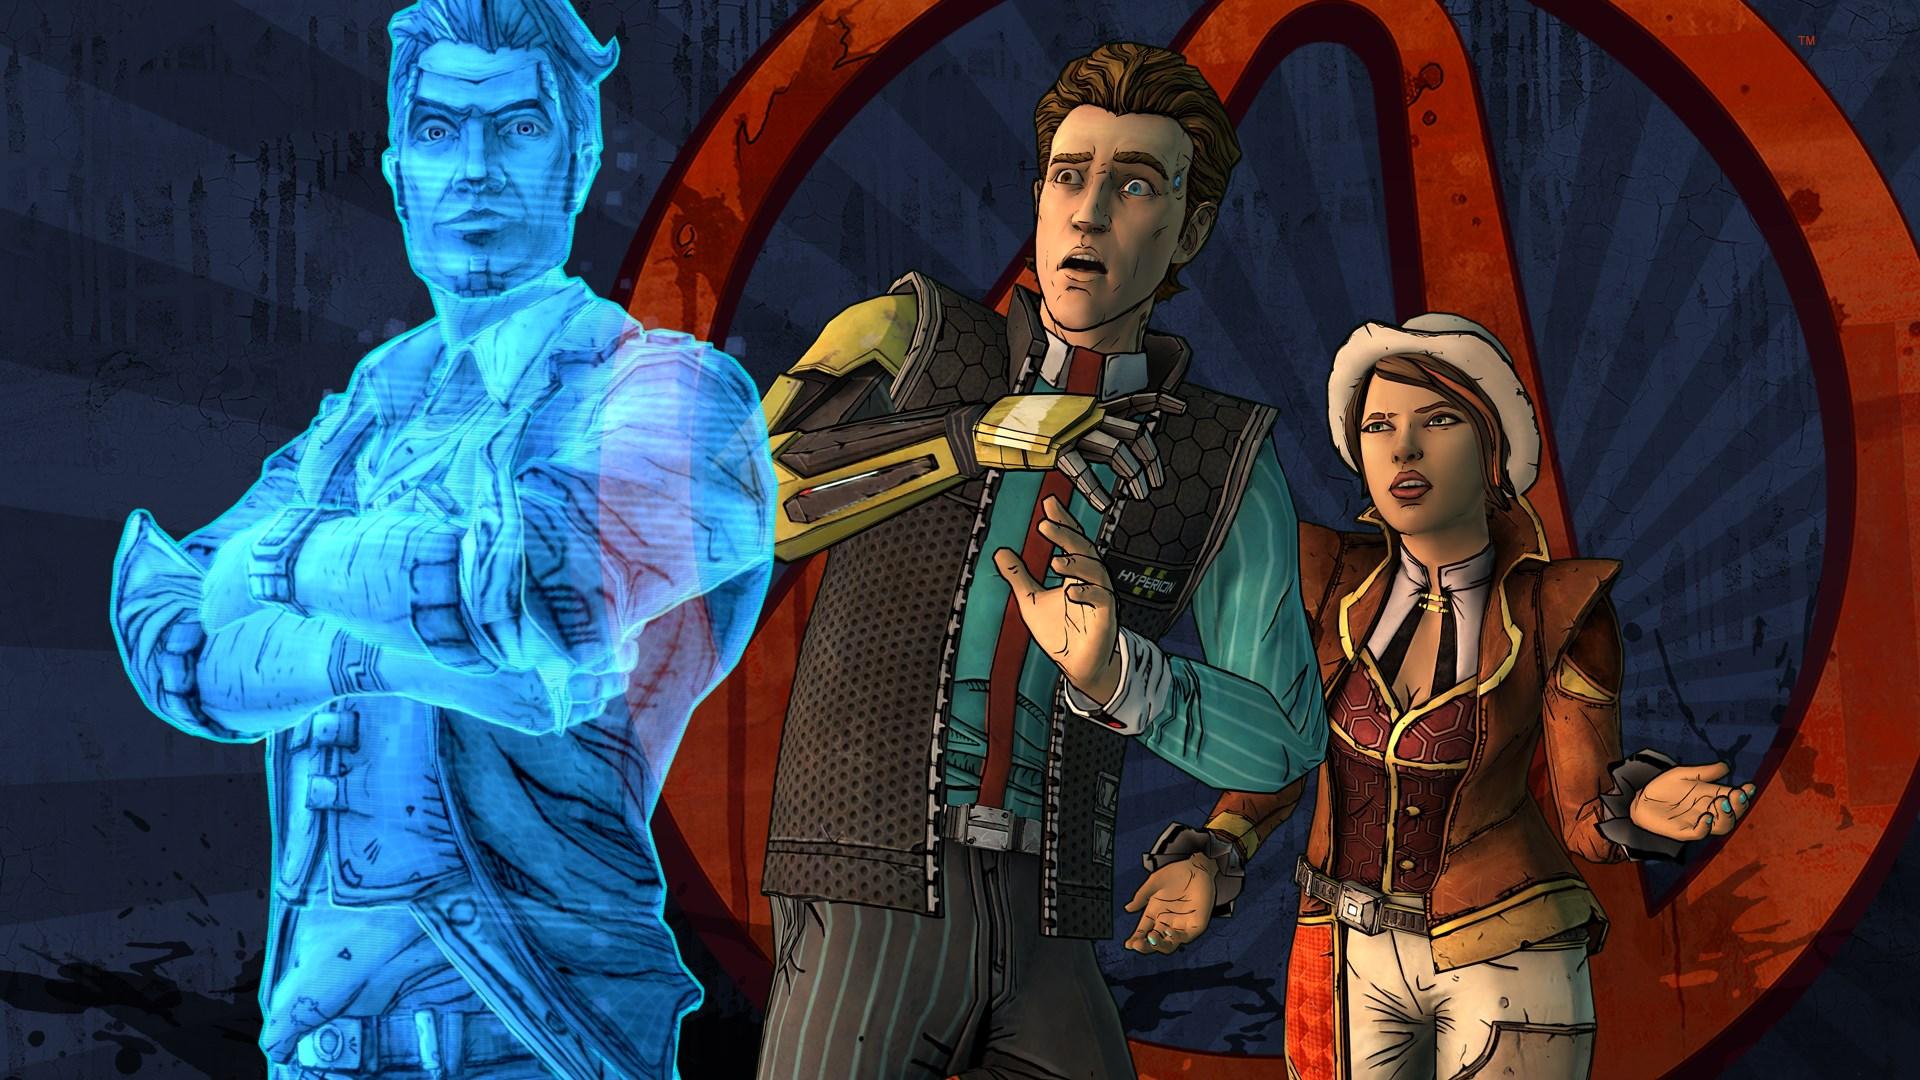 Инсайдер: Telltale работает над вторым сезоном Tales from the Borderlands